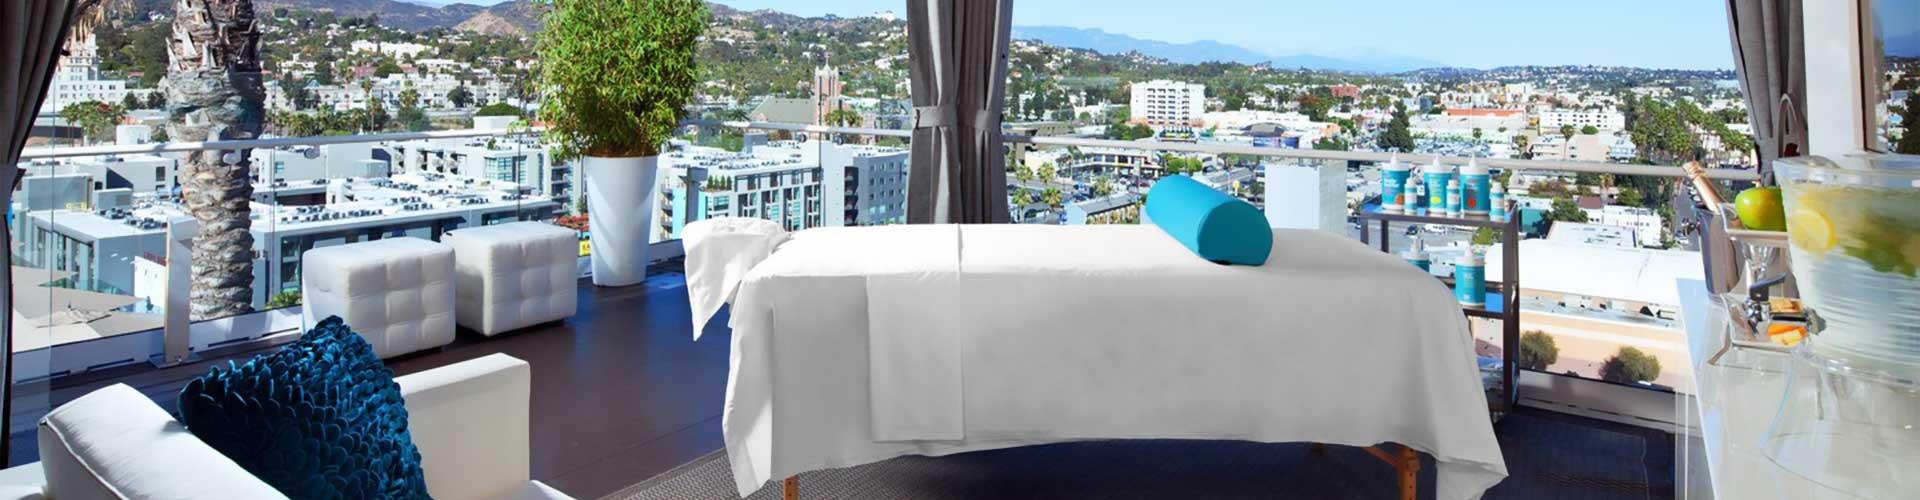 Restaurants in Hollywood